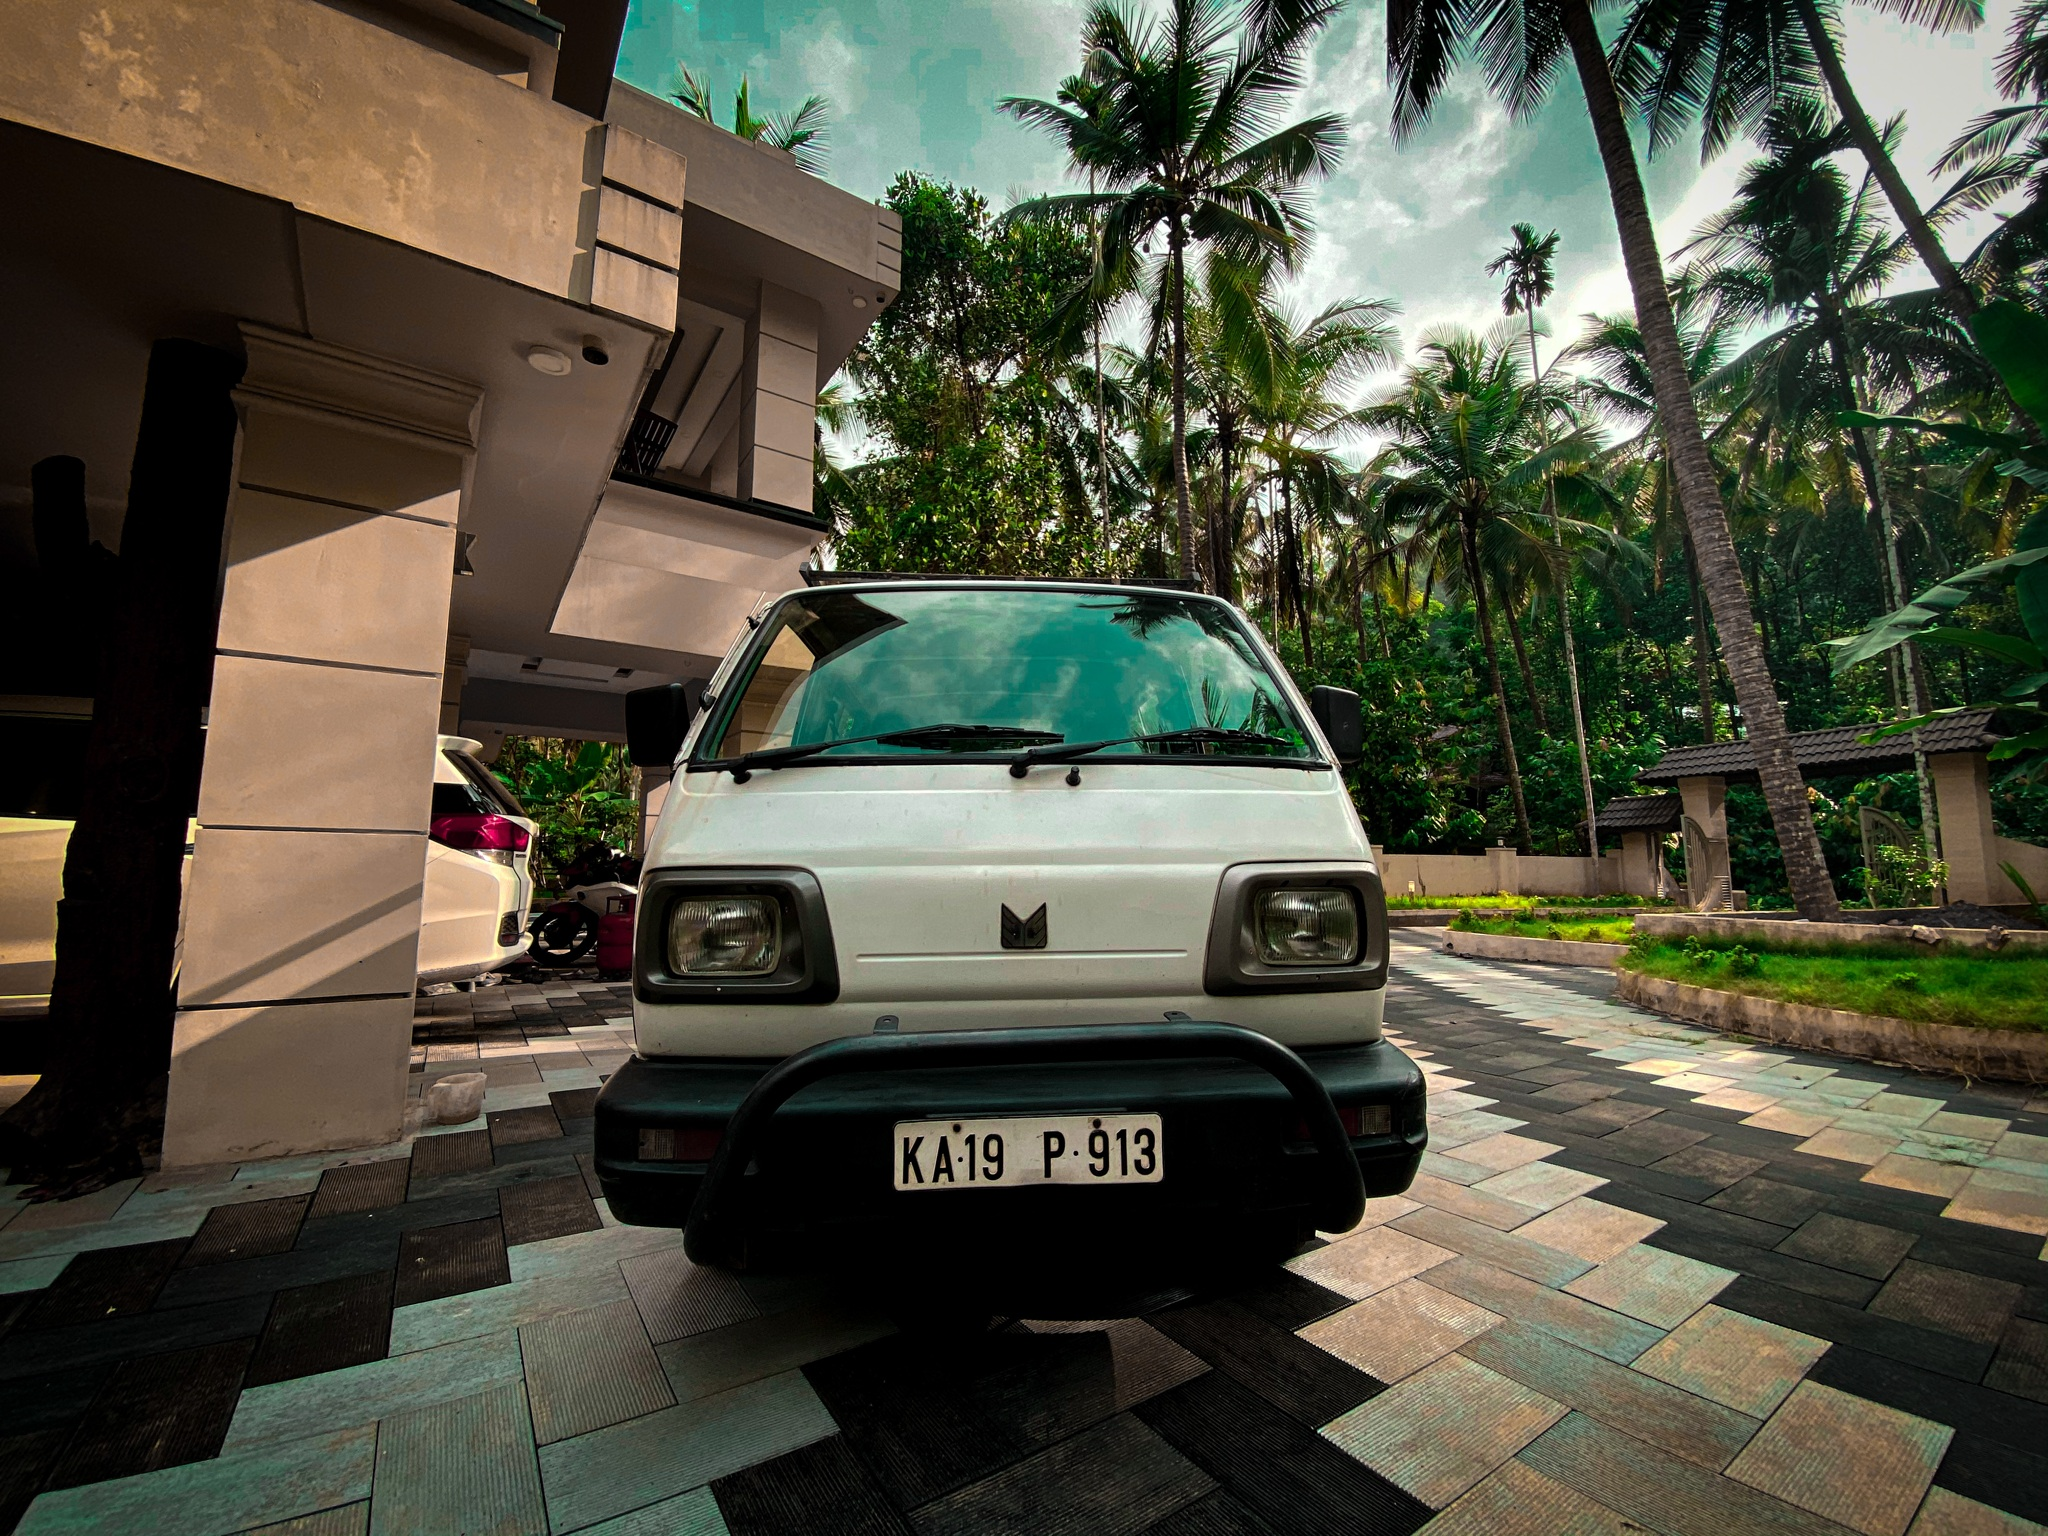 A Maruti Suzuki van